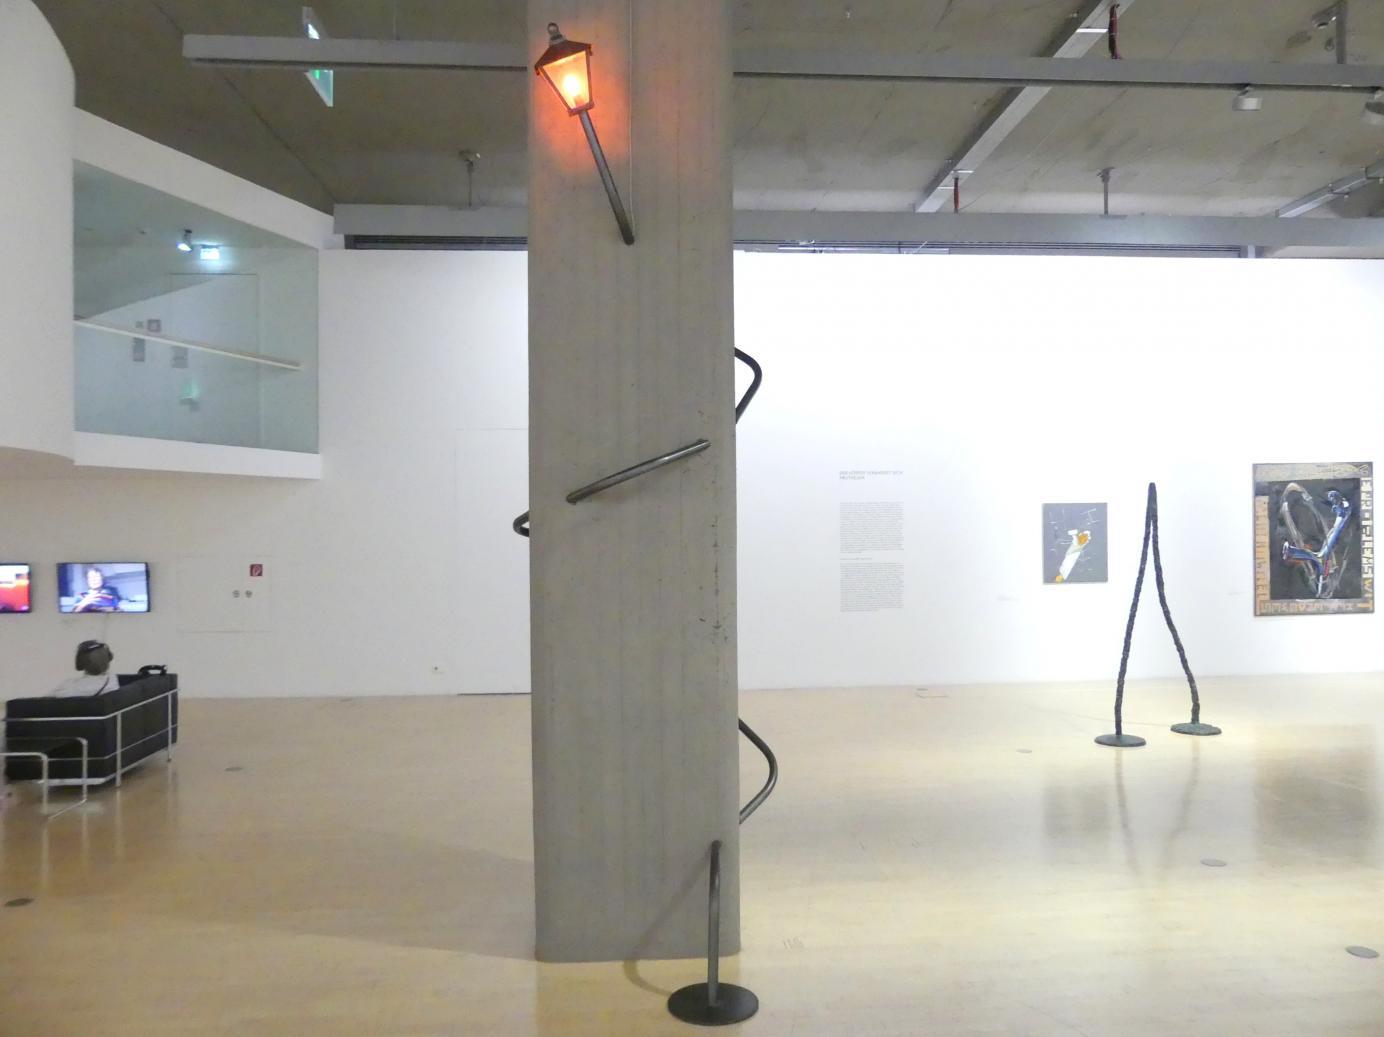 Martin Kippenberger: Ohne Titel, 1989 - 1990